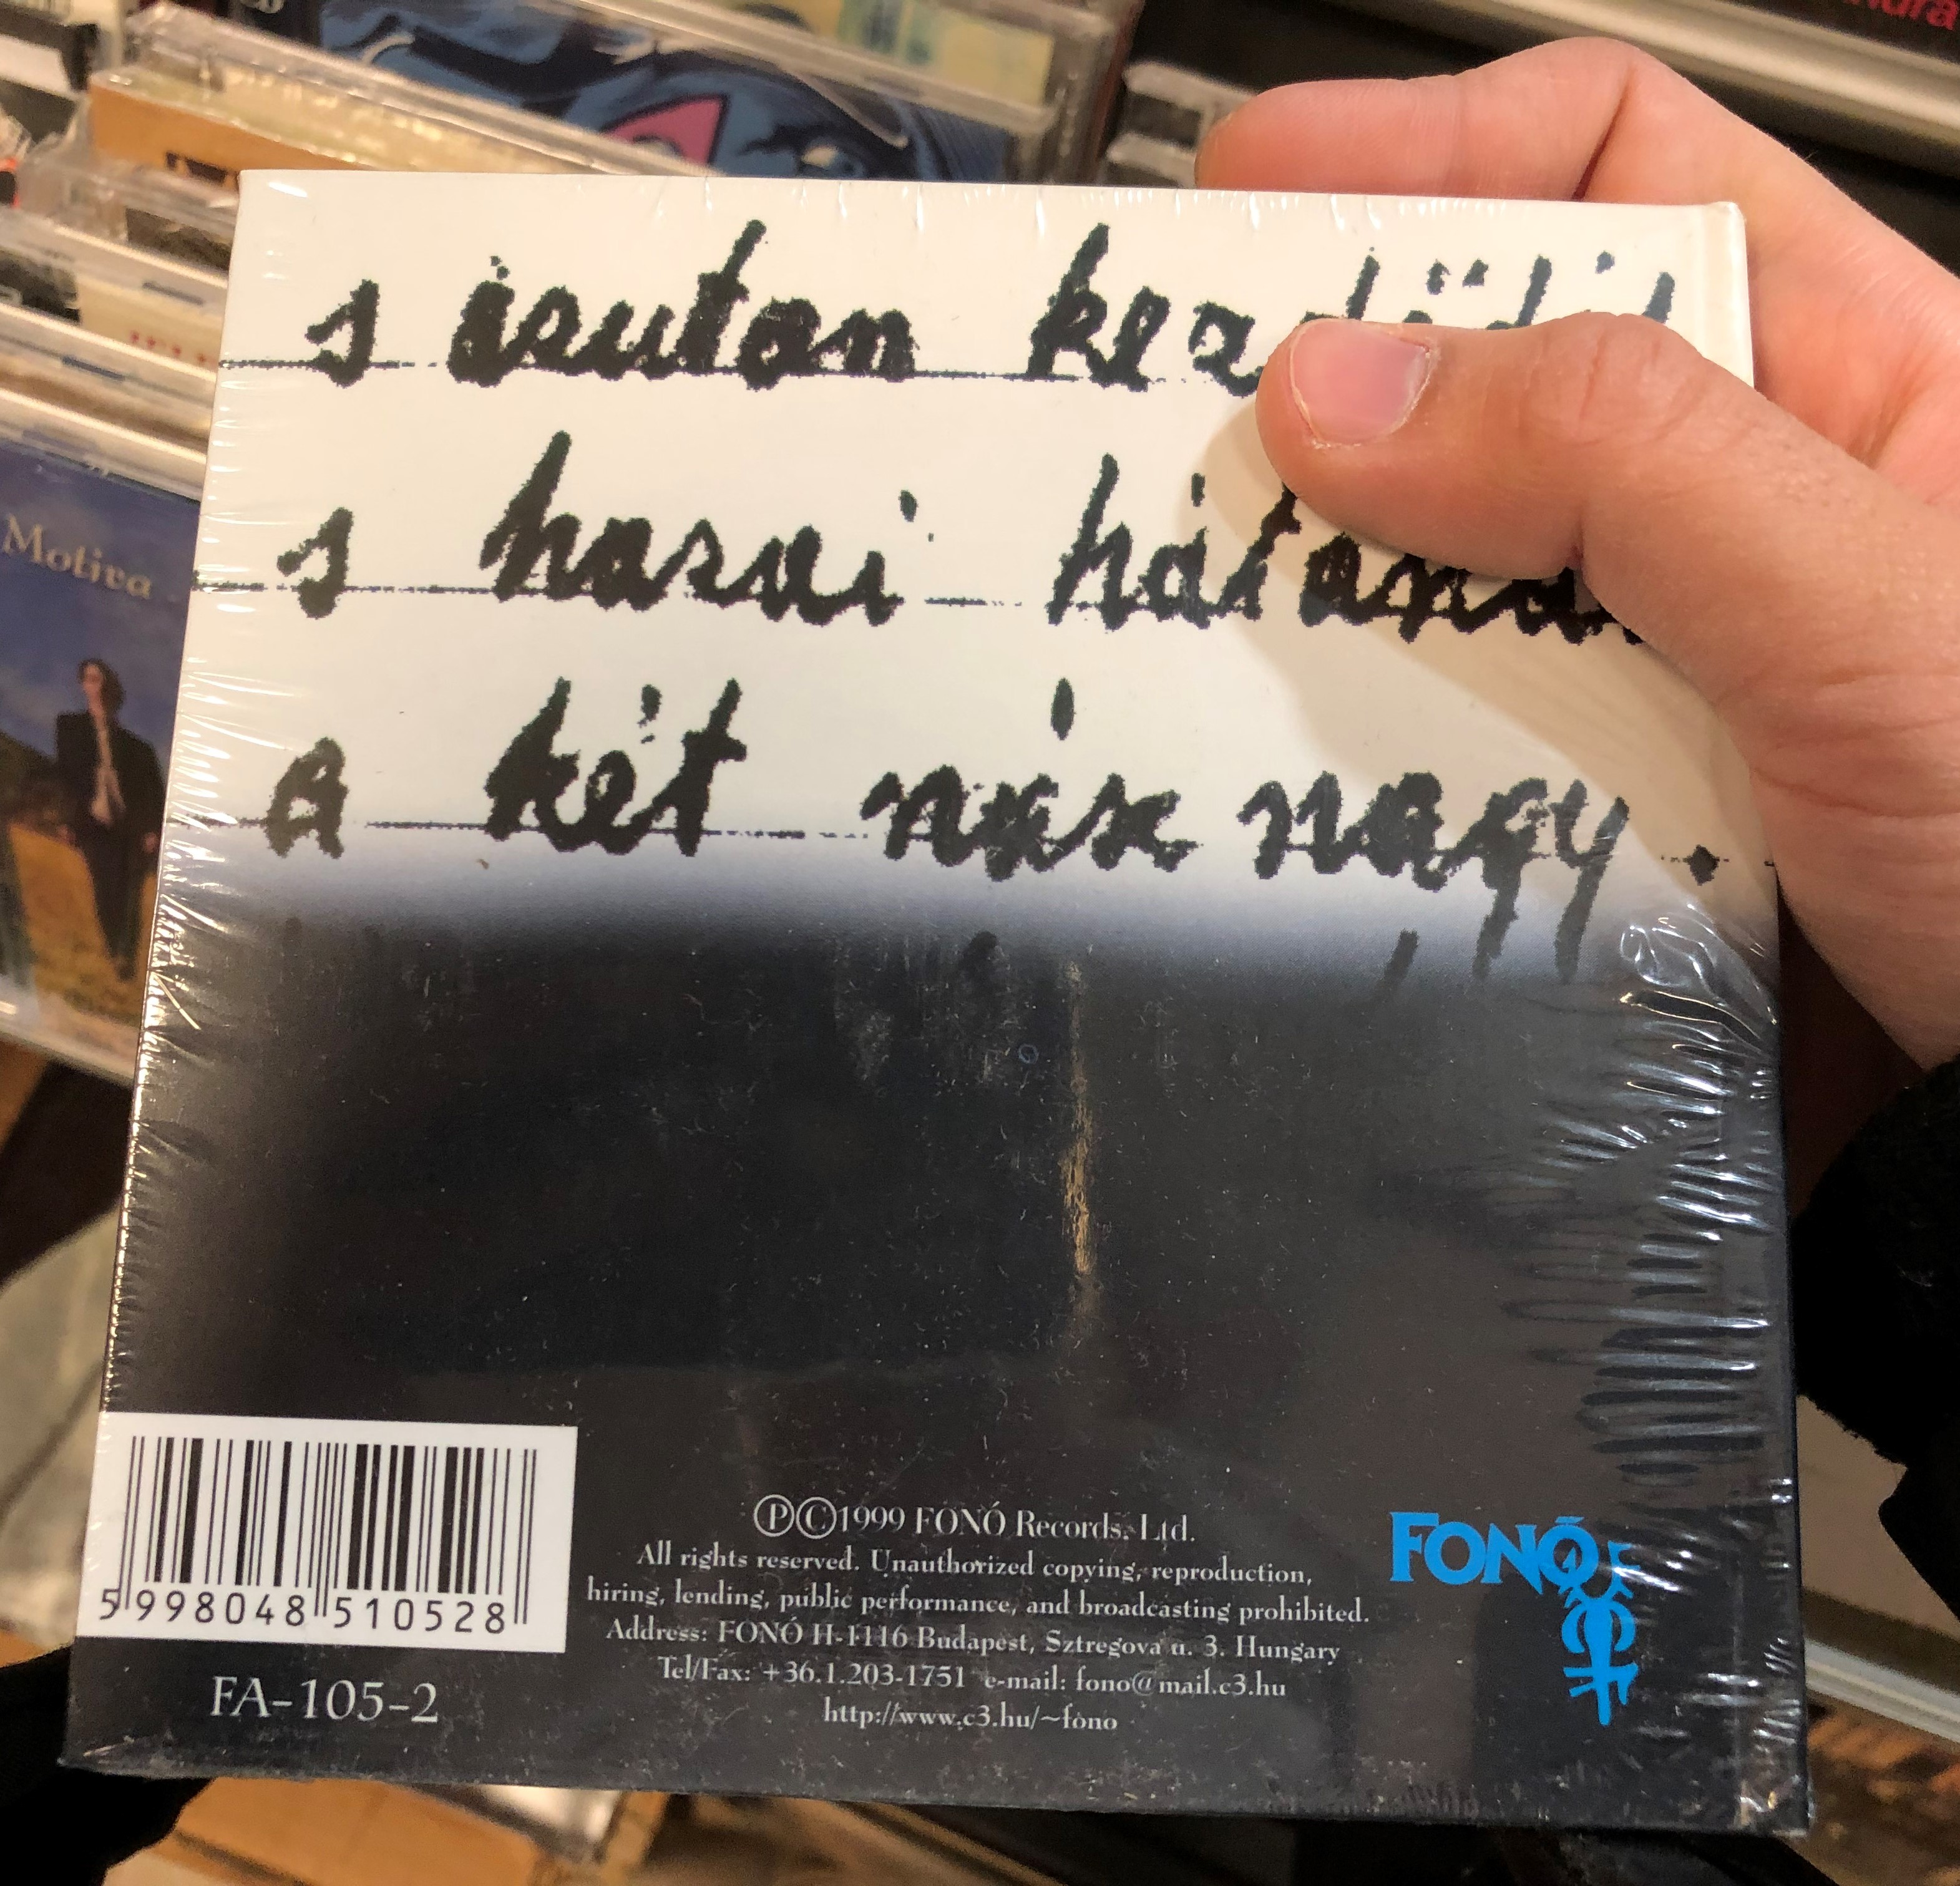 11-j-p-tria-az-utols-ra-gy-jtem-ny-b-l-1997-1998-szil-gys-gi-n-pzene-szil-gynagyfalu-szil-gybagos-original-village-music-from-transylvania-fon-records-audio-cd-1999-fa-105-2-2-.jpg